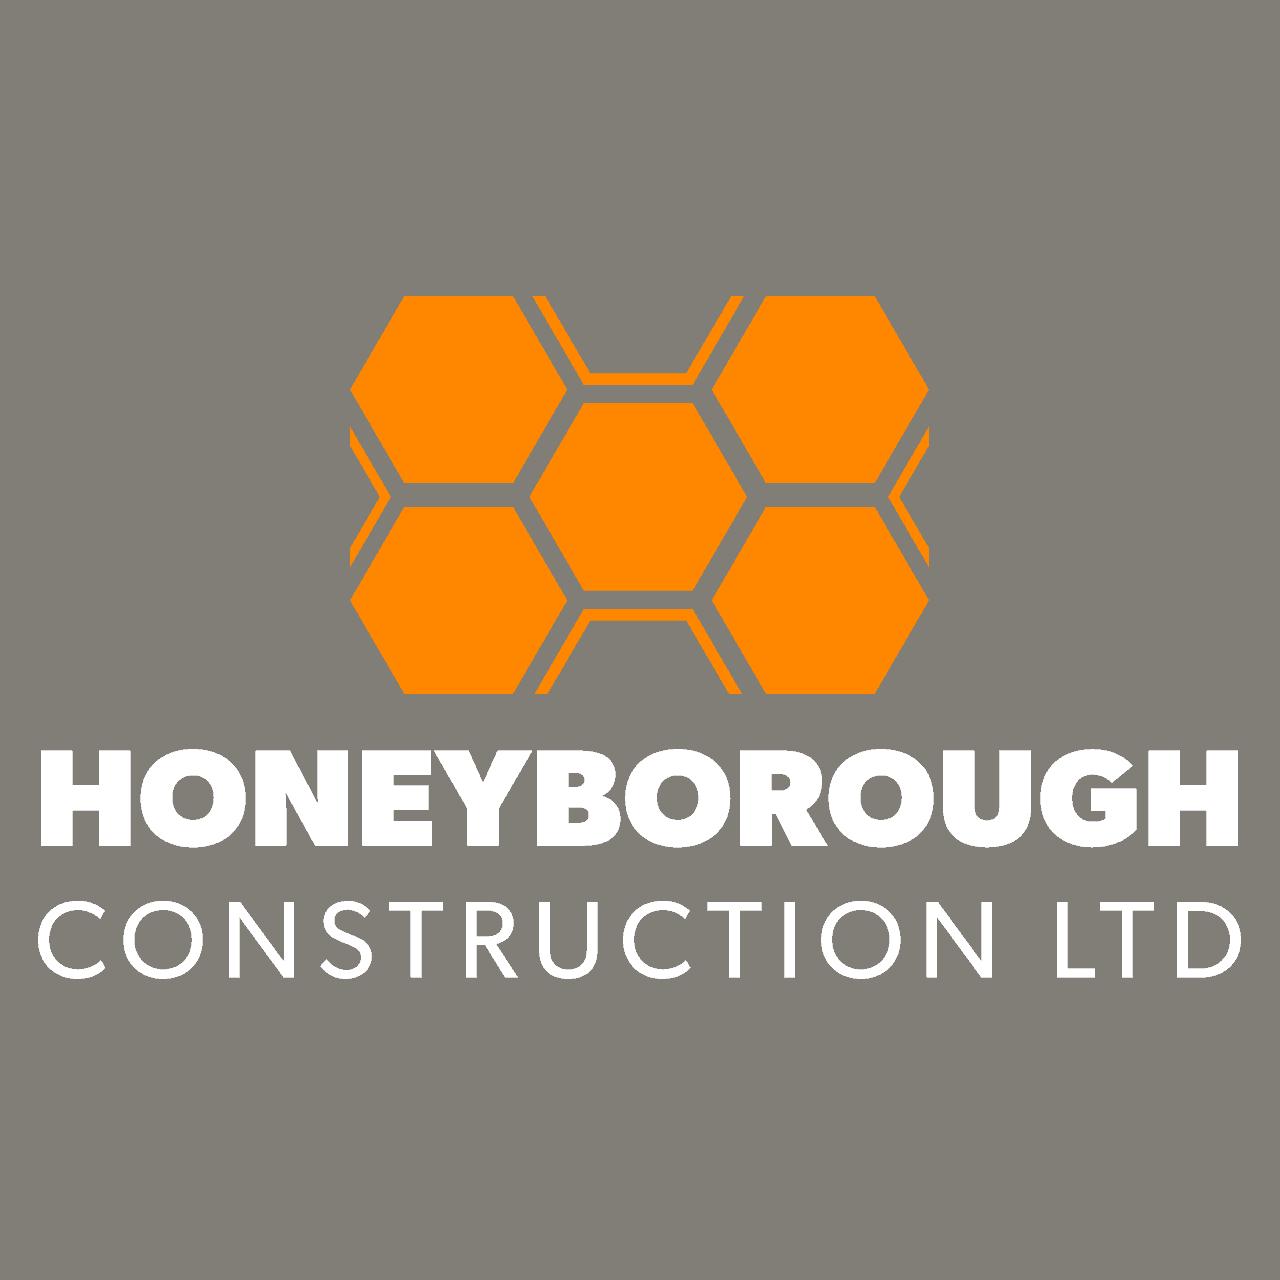 Honeyborough ConstructionWeb Design Case Study